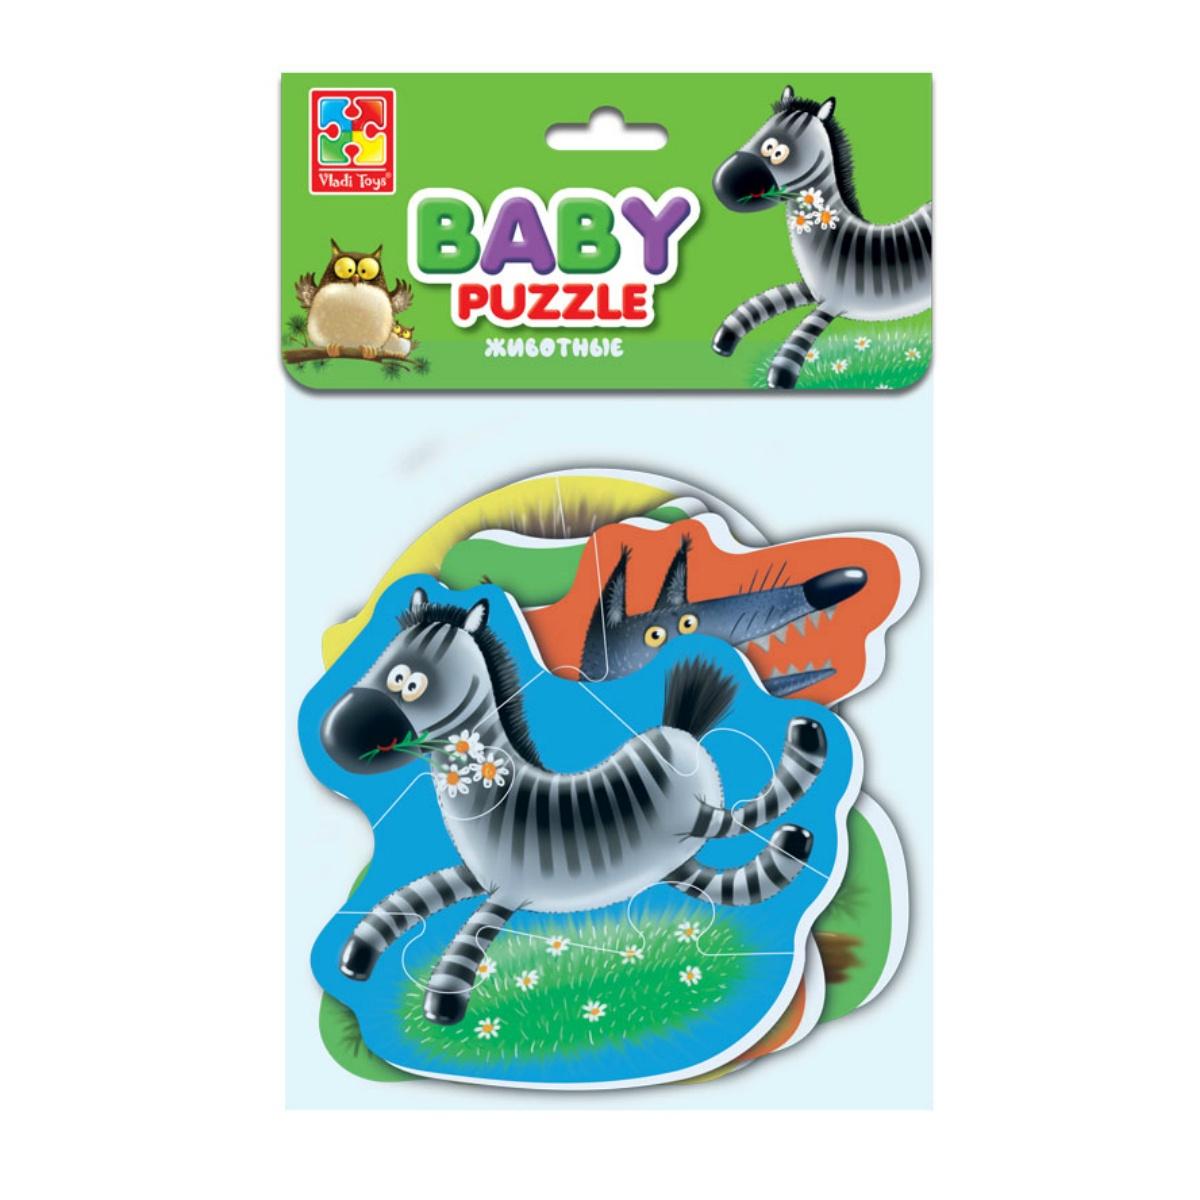 Мягкие пазлы Baby puzzle Животные baby toys макси пазлы baby toys зигзаг домашние животные 18 элементов